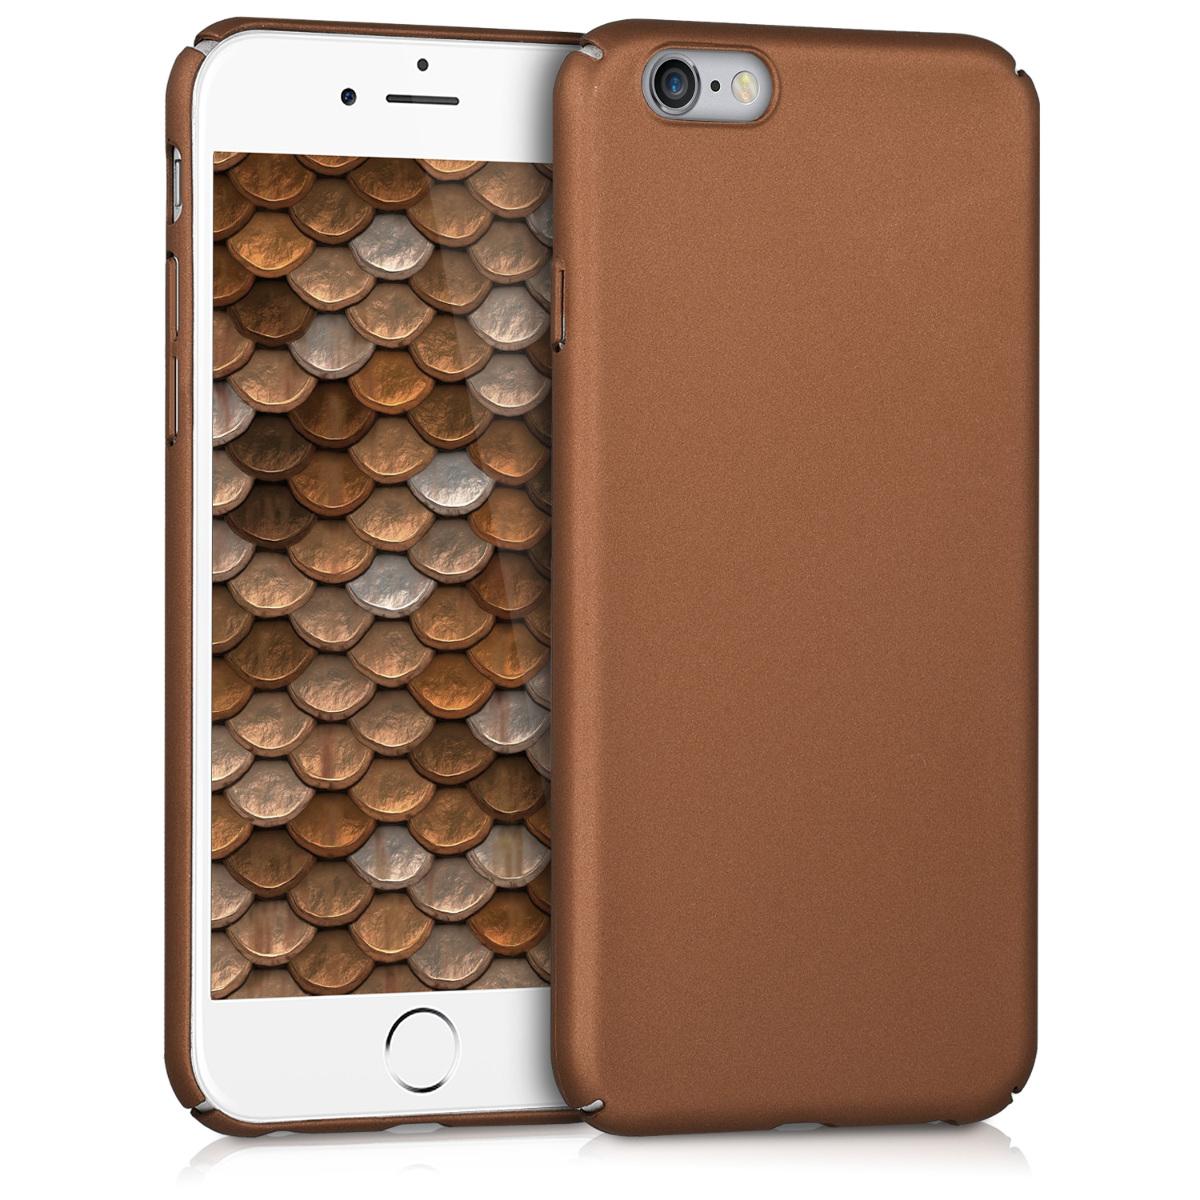 KW Slim Anti-Slip Cover - Σκληρή Θήκη Καουτσούκ iPhone 6 / 6S - Χάλκινο/ Μεταλλικό (42427.27)